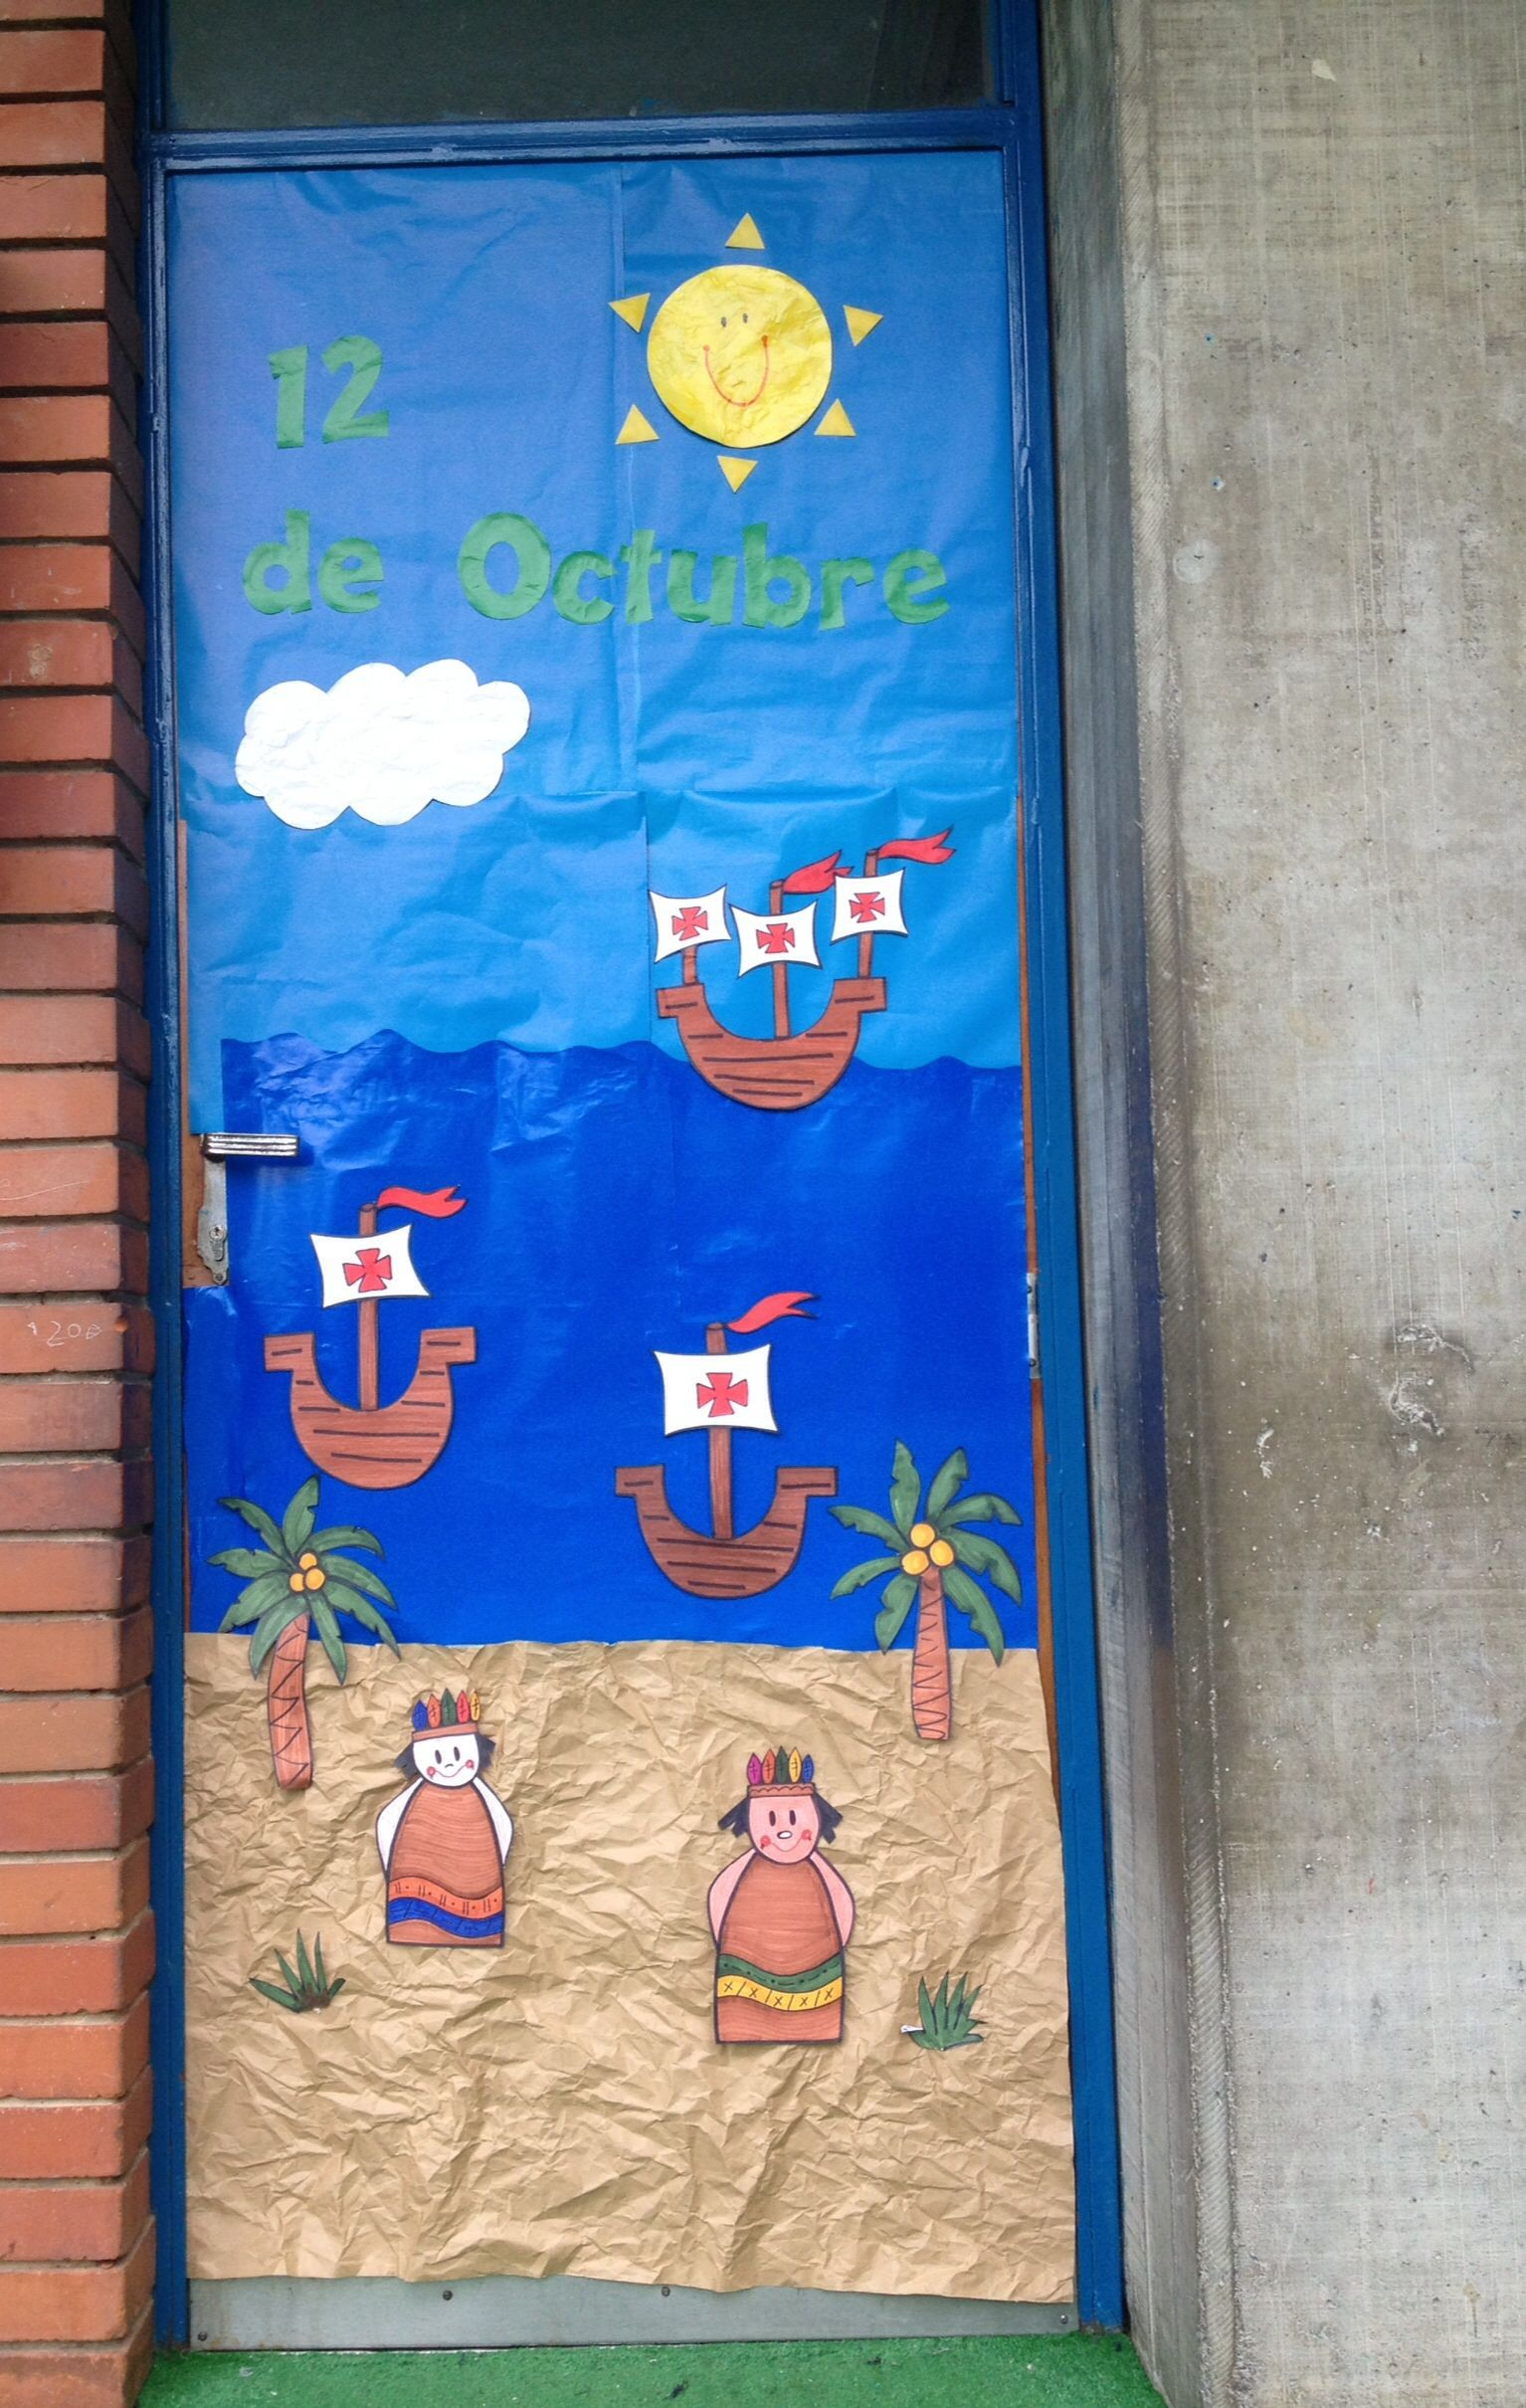 Calendario Escolar Infantil Para Imprimir Más Populares 12 De Octubre … Class Ideas Of Calendario Escolar Infantil Para Imprimir Recientes Plantillas Para Hacer Relojes De Pared Esferas Para Decorar